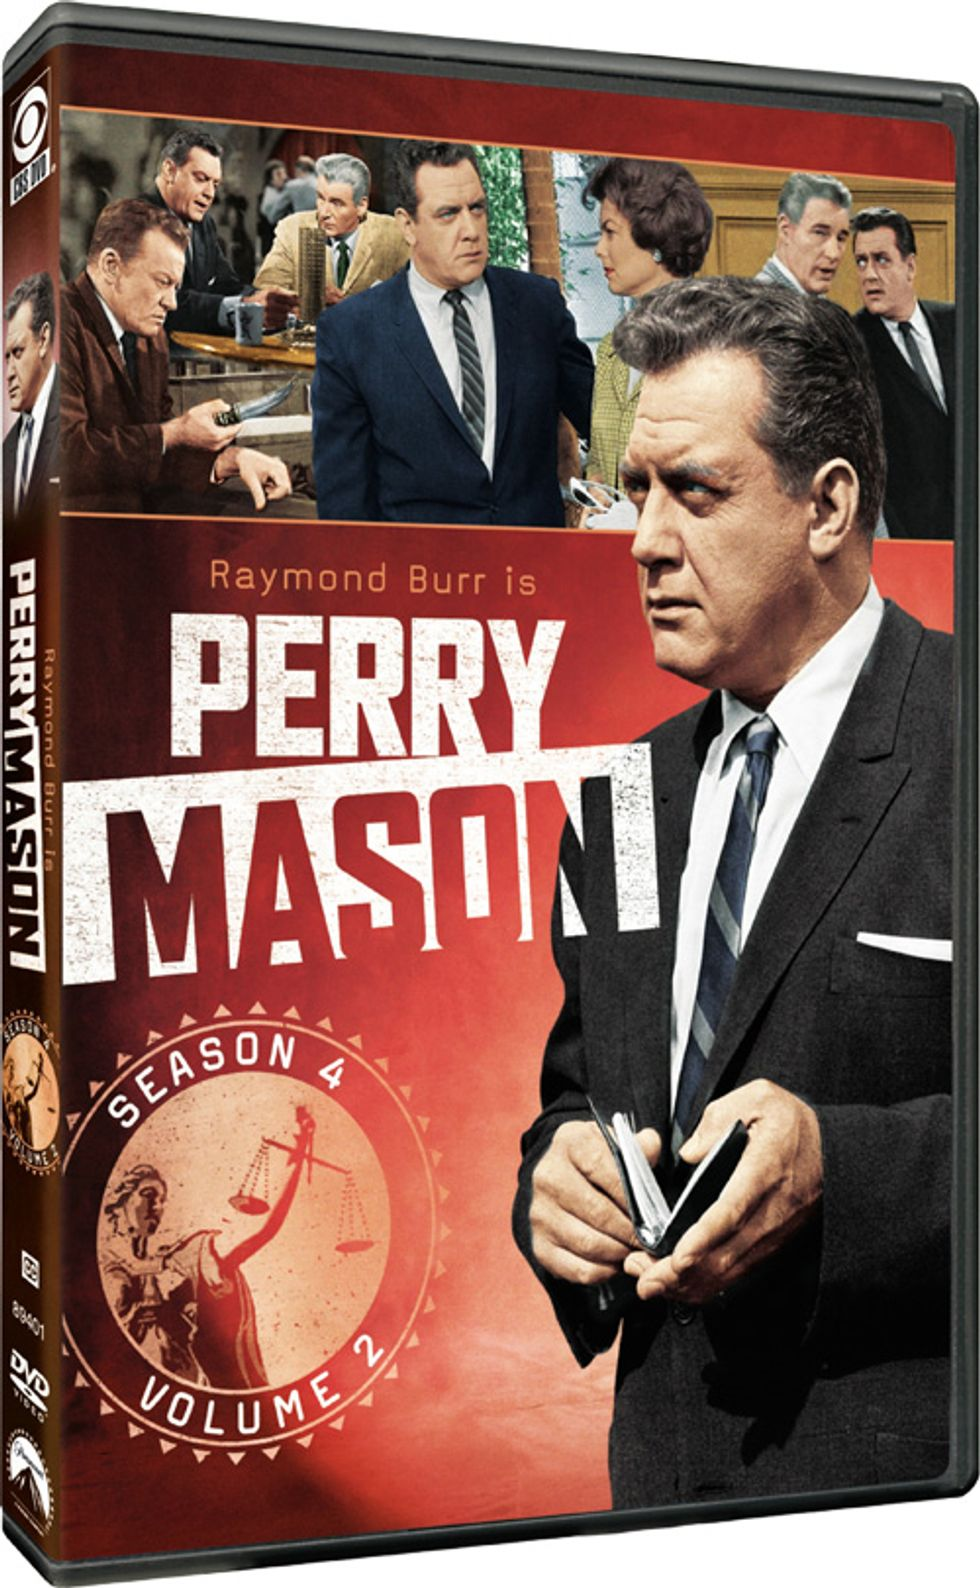 Perry Mason Season 4: Volume 2 On DVD!